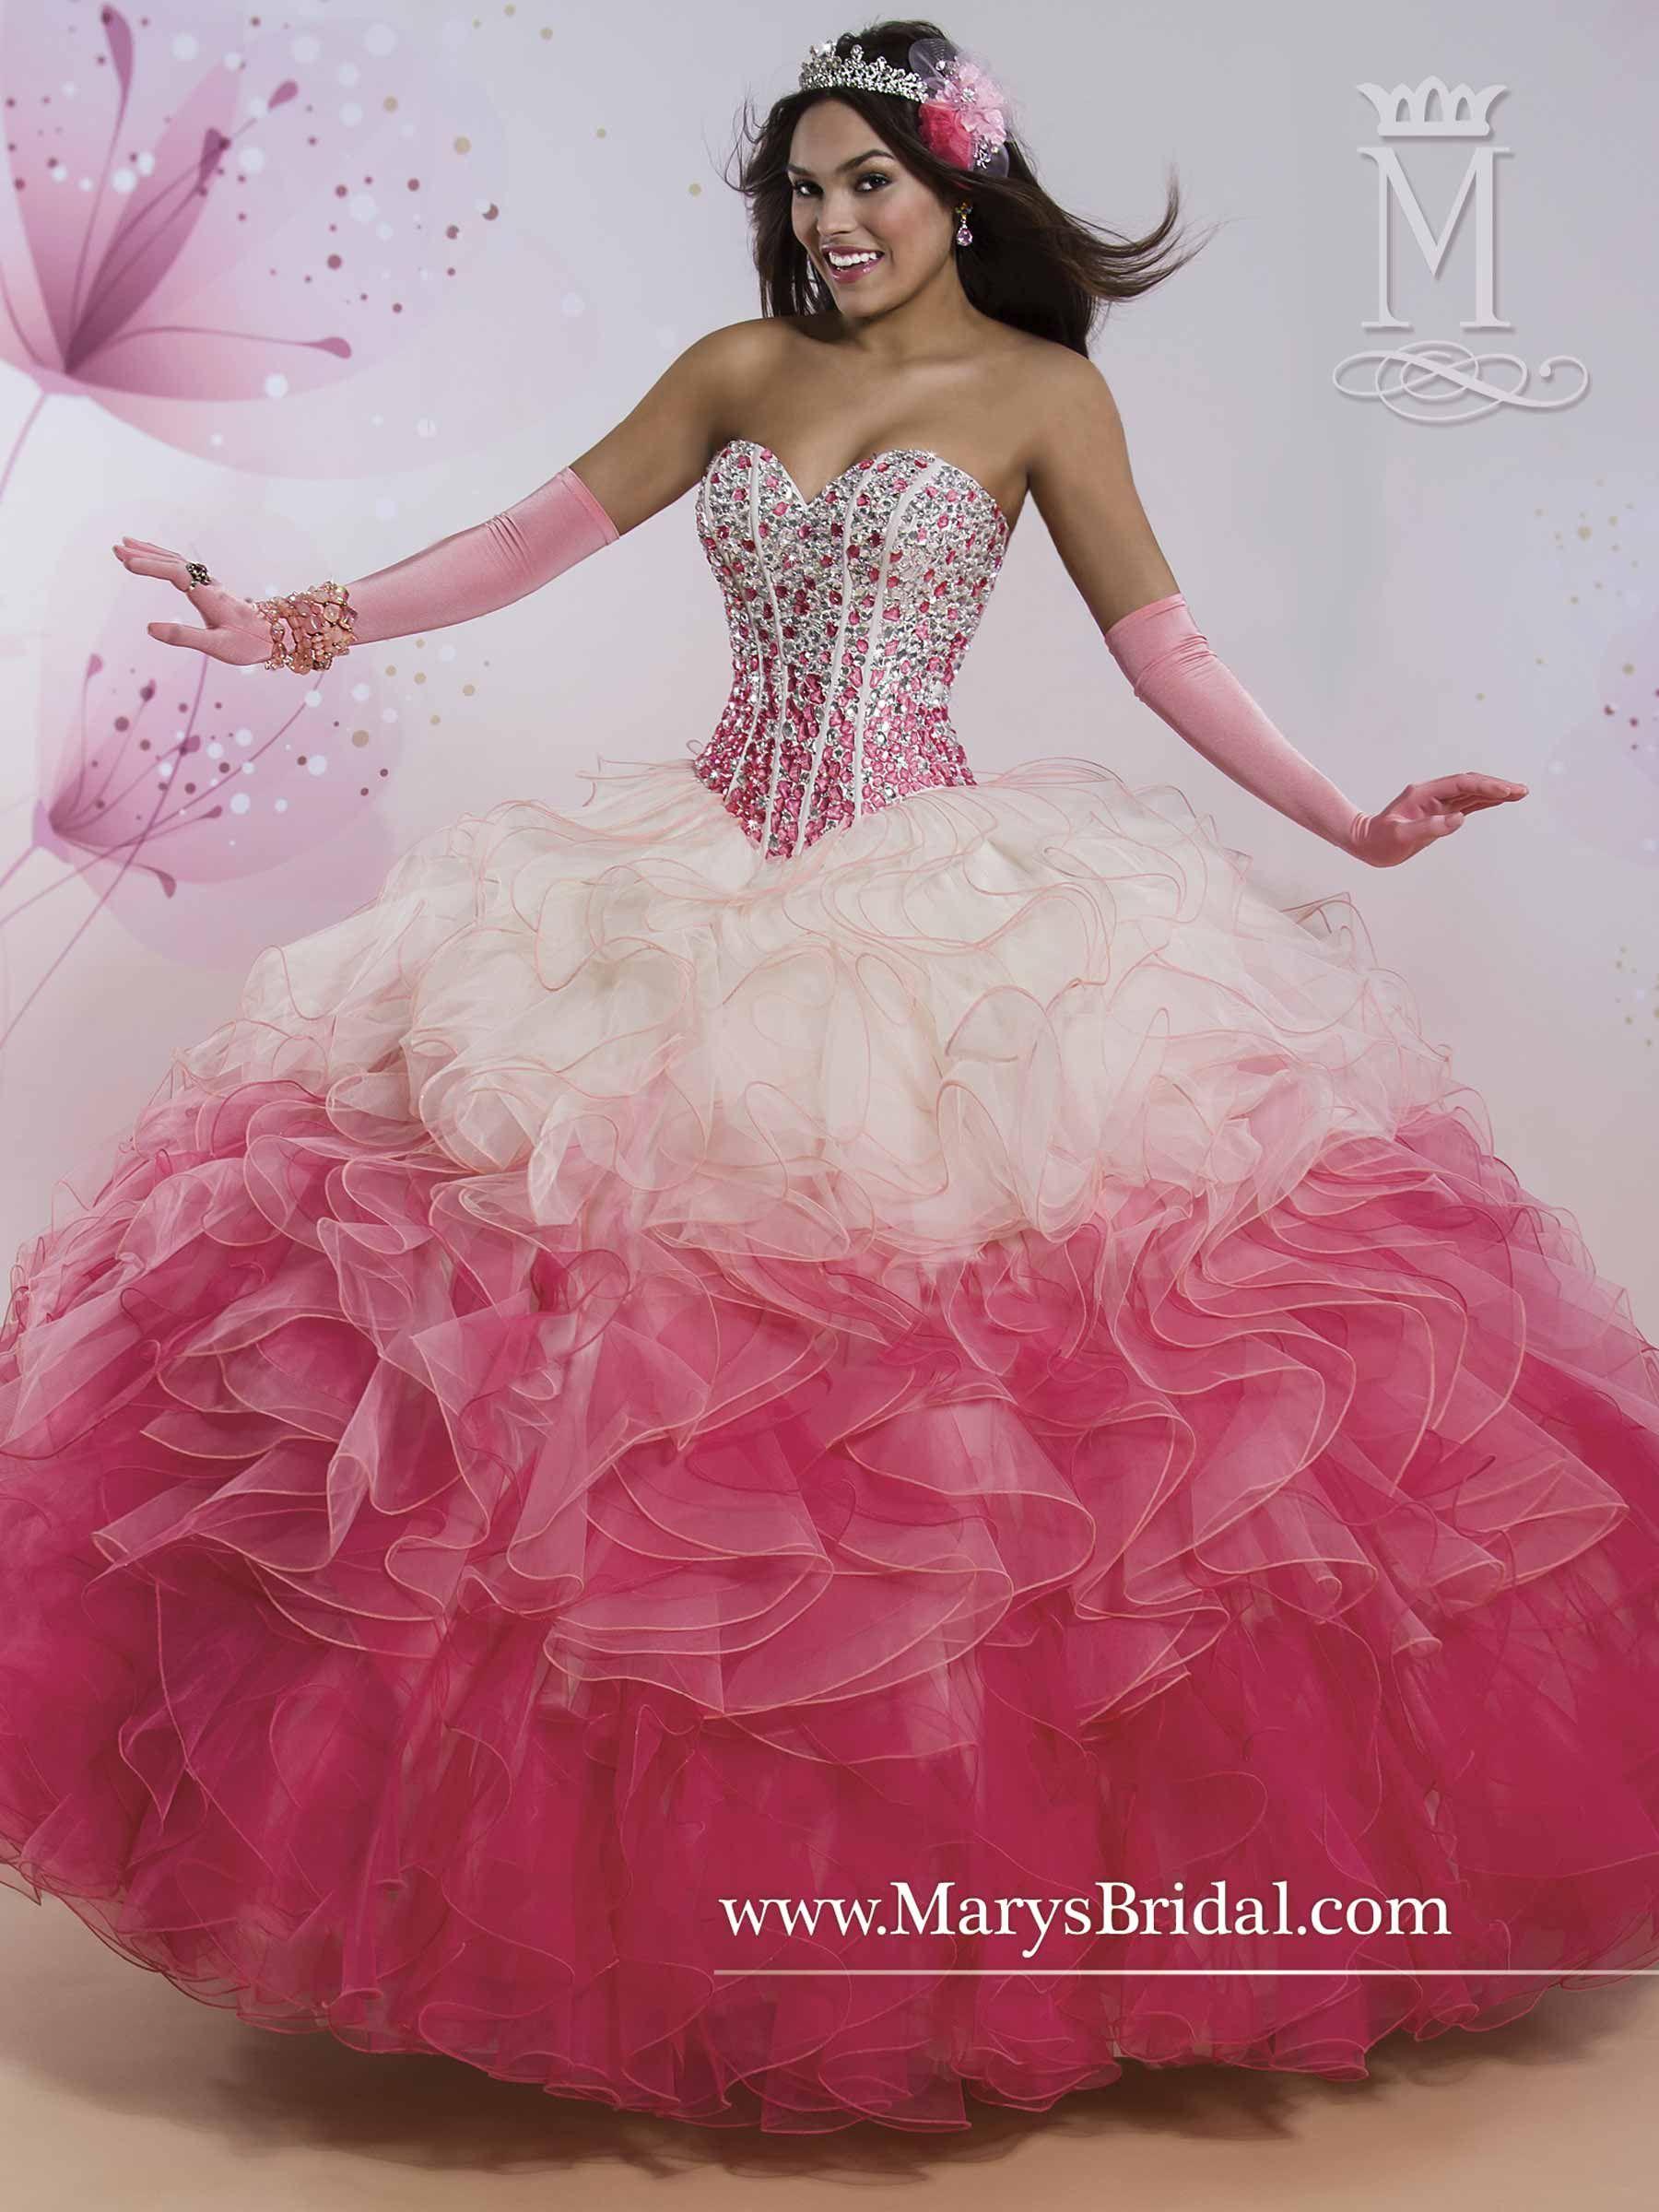 Sweet 16 / Quinceanera Dress - M200Q403 | LBH | Sweet 16 ...